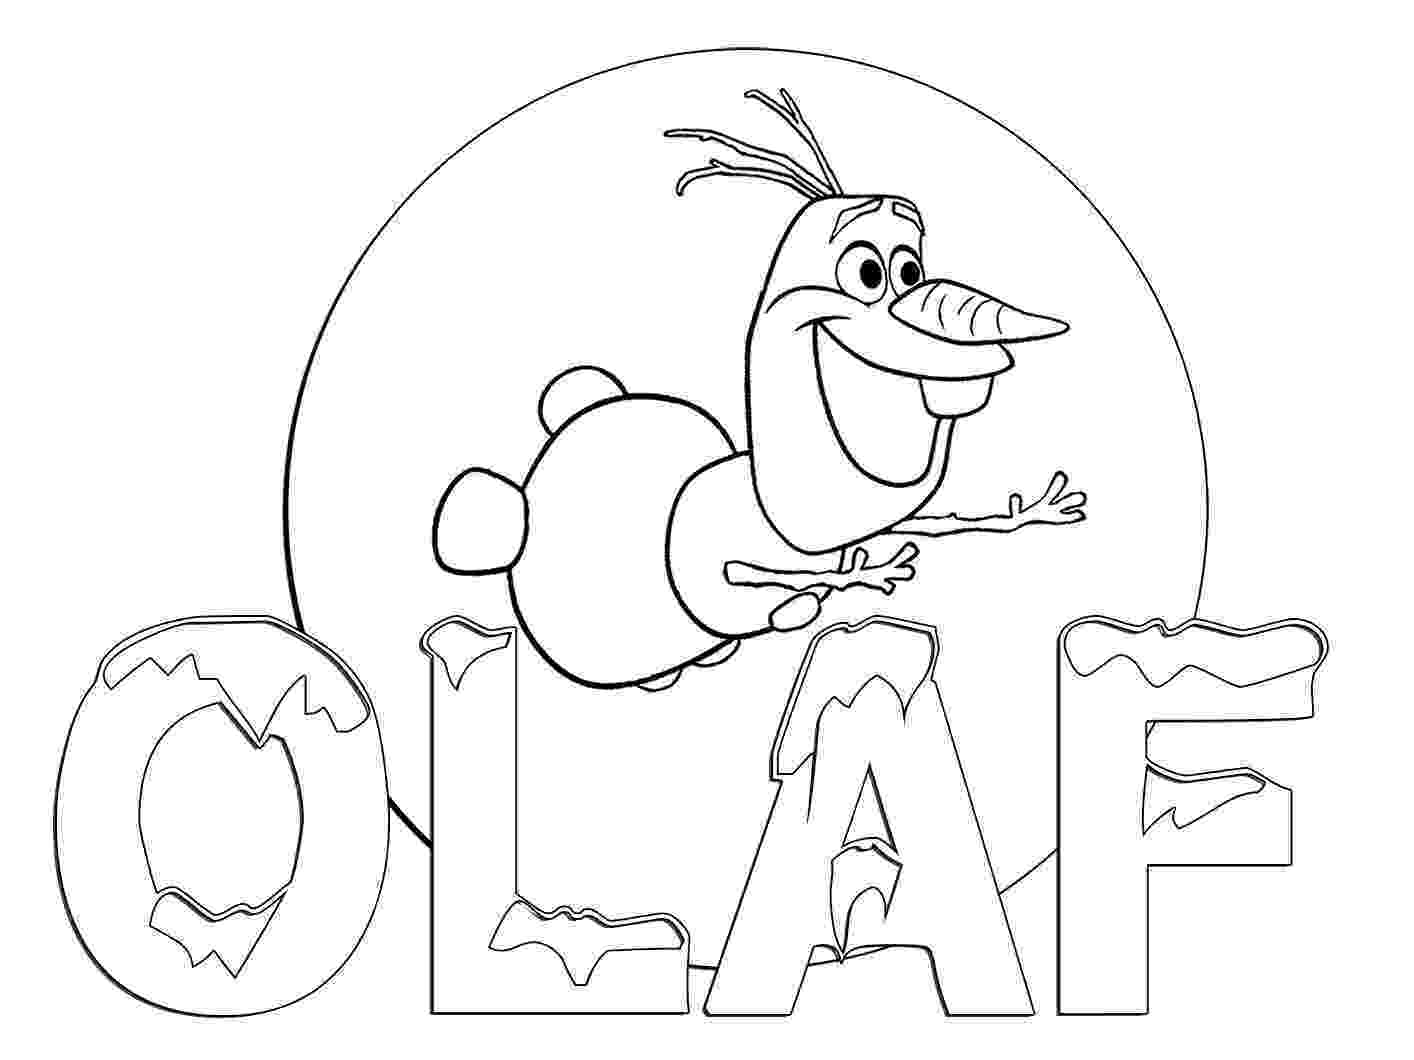 frozen color pages free printable frozen coloring pages for kids best pages frozen color